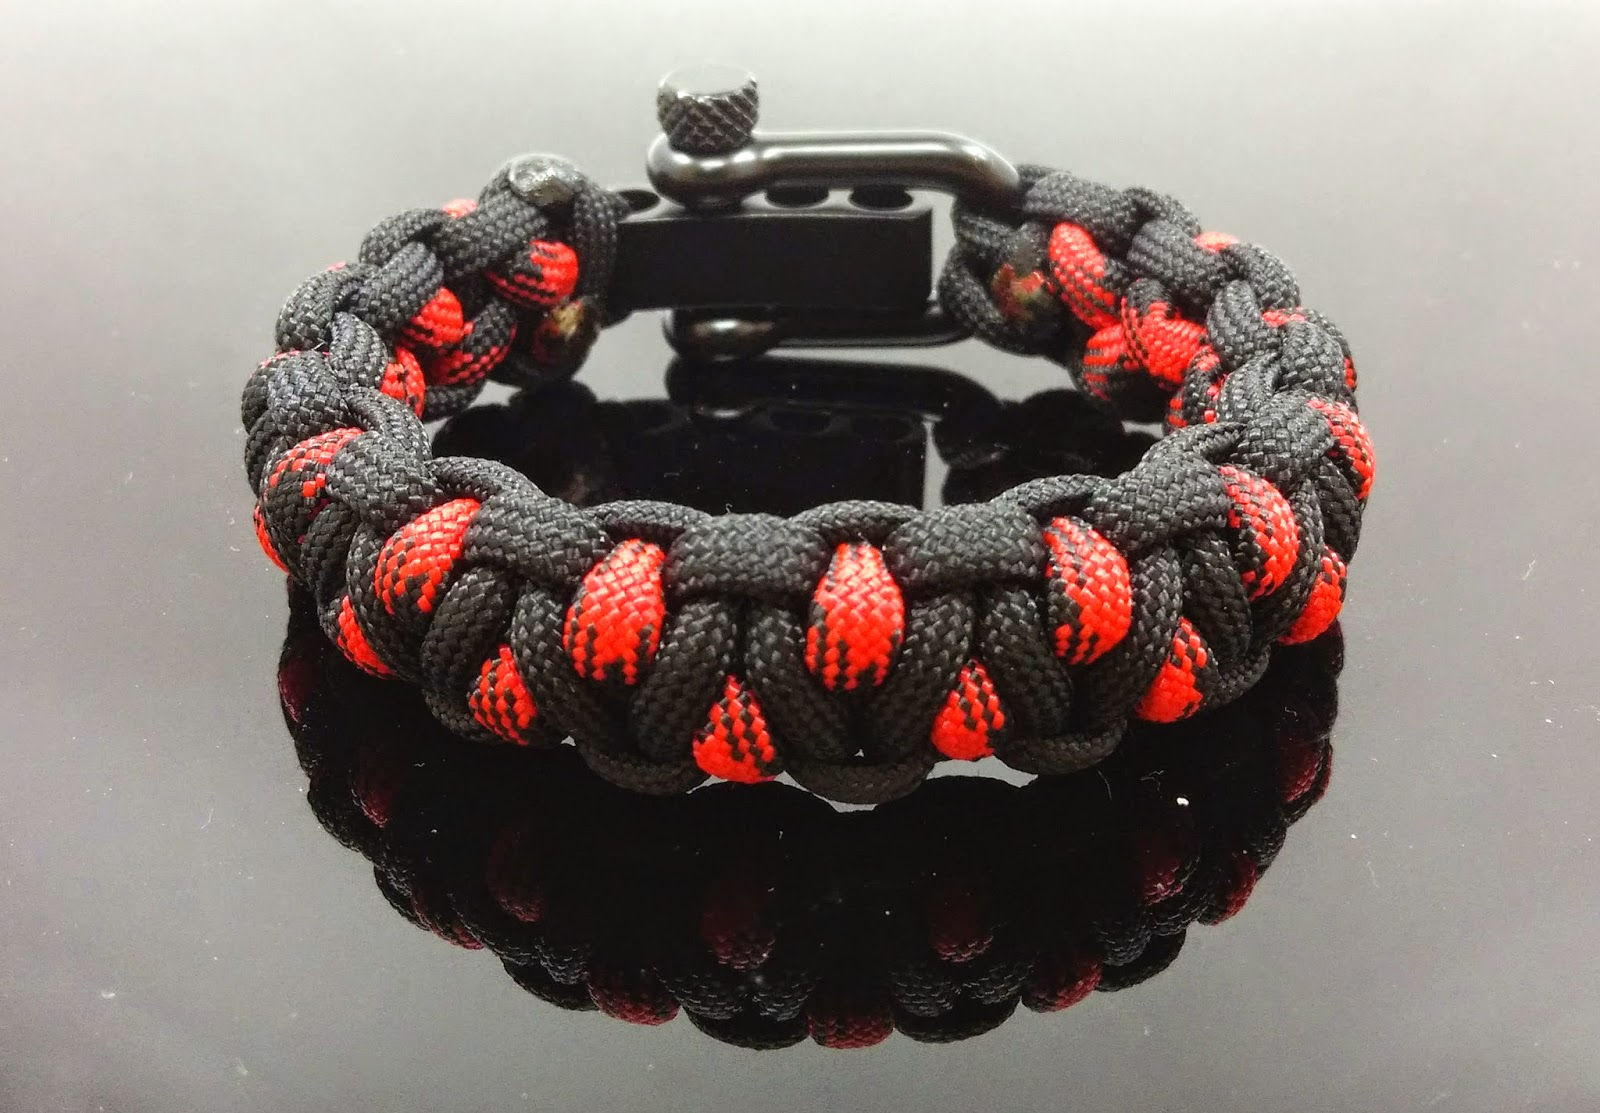 Solomon's Dragon Paracord Survival Bracelets with Black Adjustable Stainless Steel Shackle